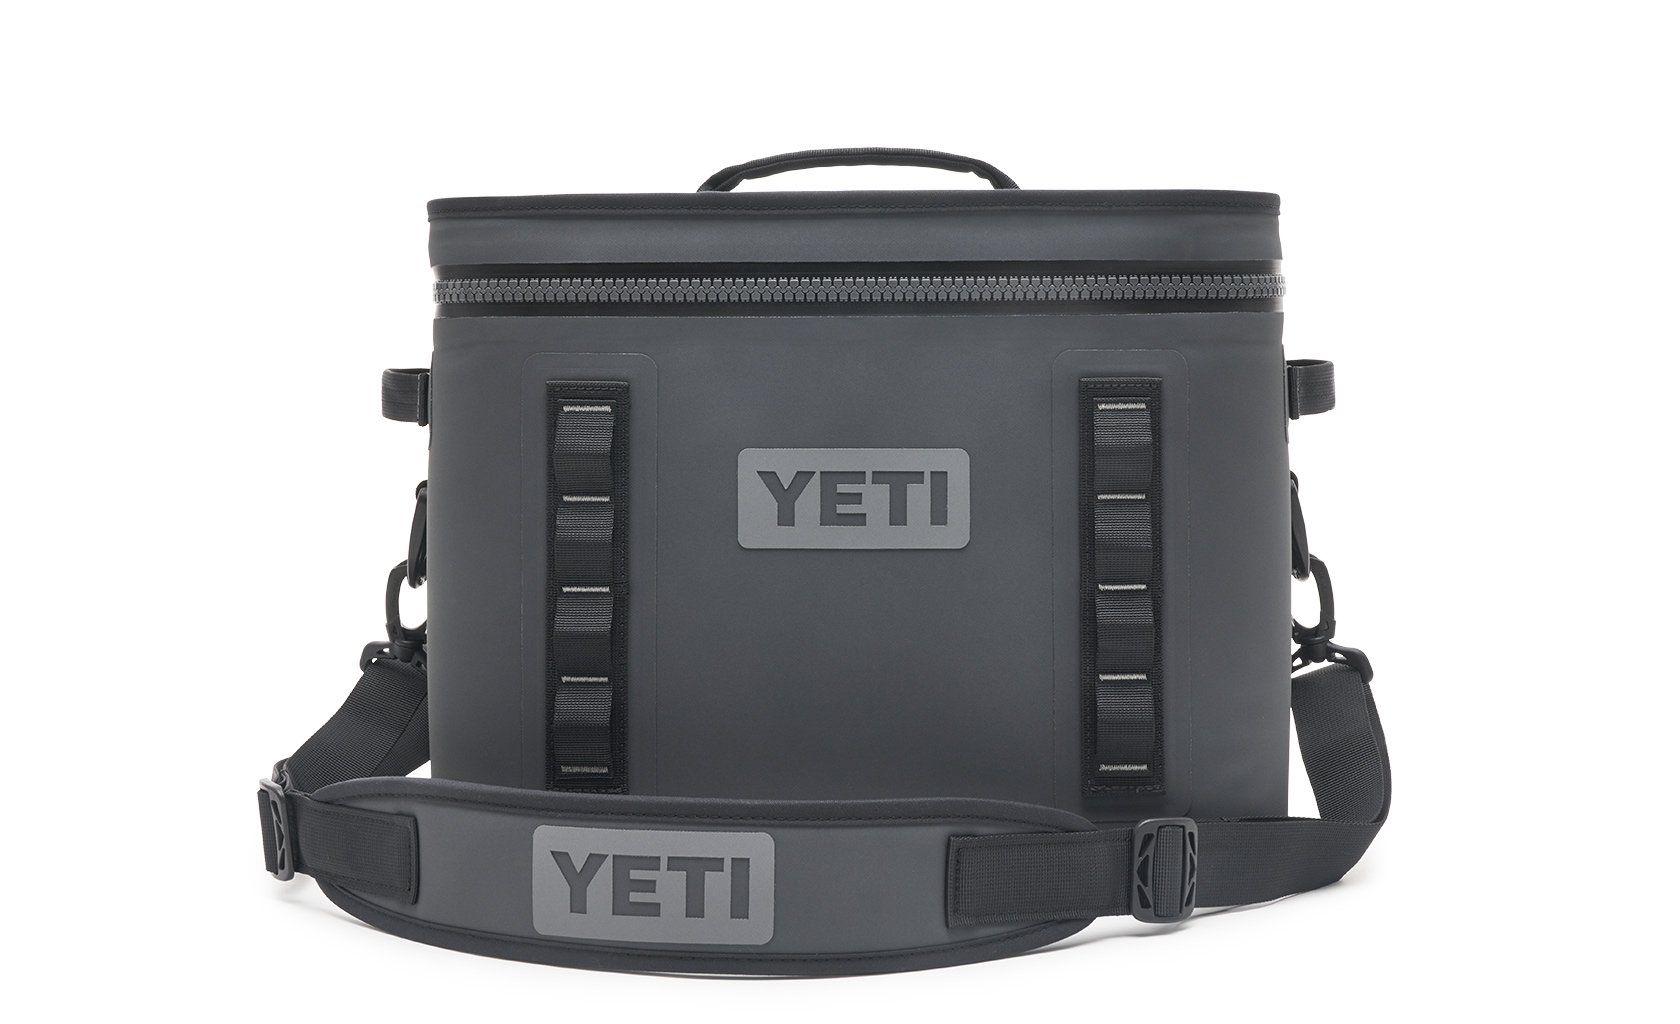 Yeti Hopper M30 Soft Cooler In 2020 Soft Cooler Portable Cooler Soft Sided Coolers